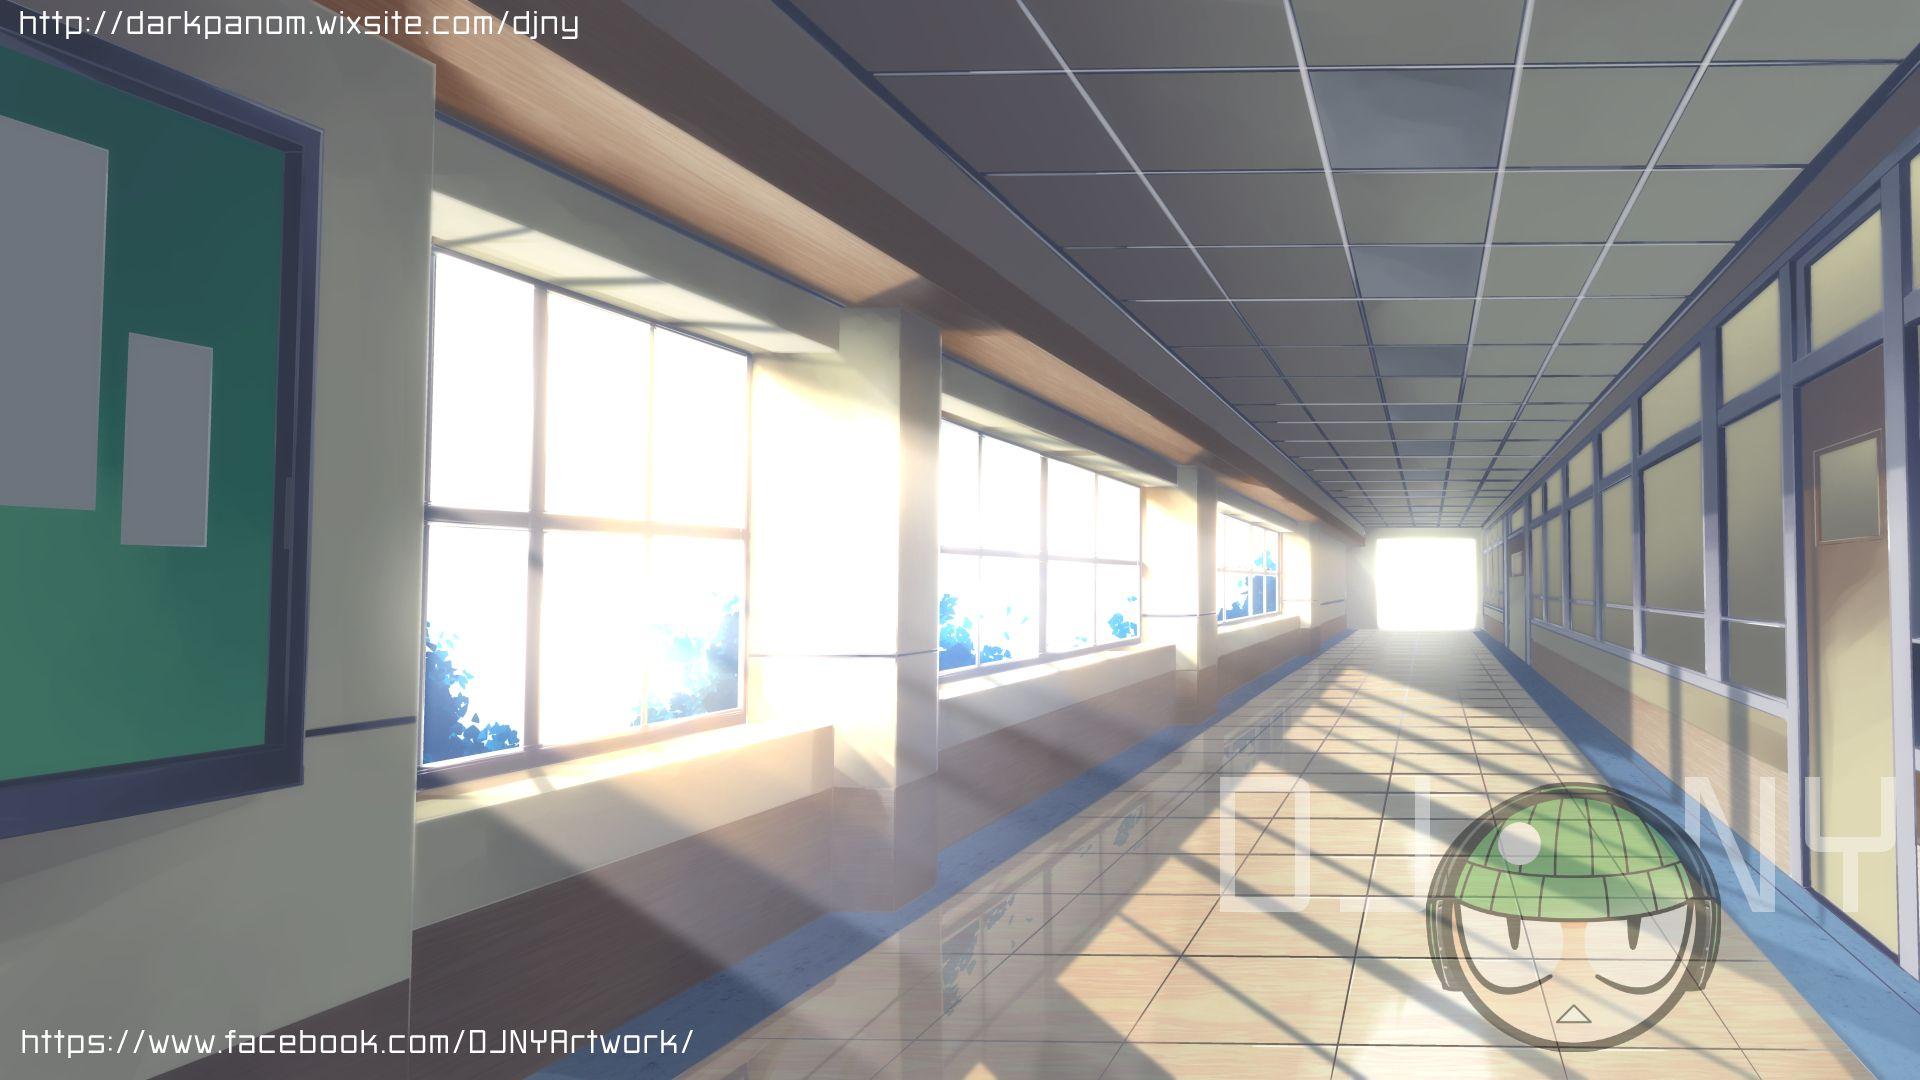 School Hallway School Hallways Hallway School